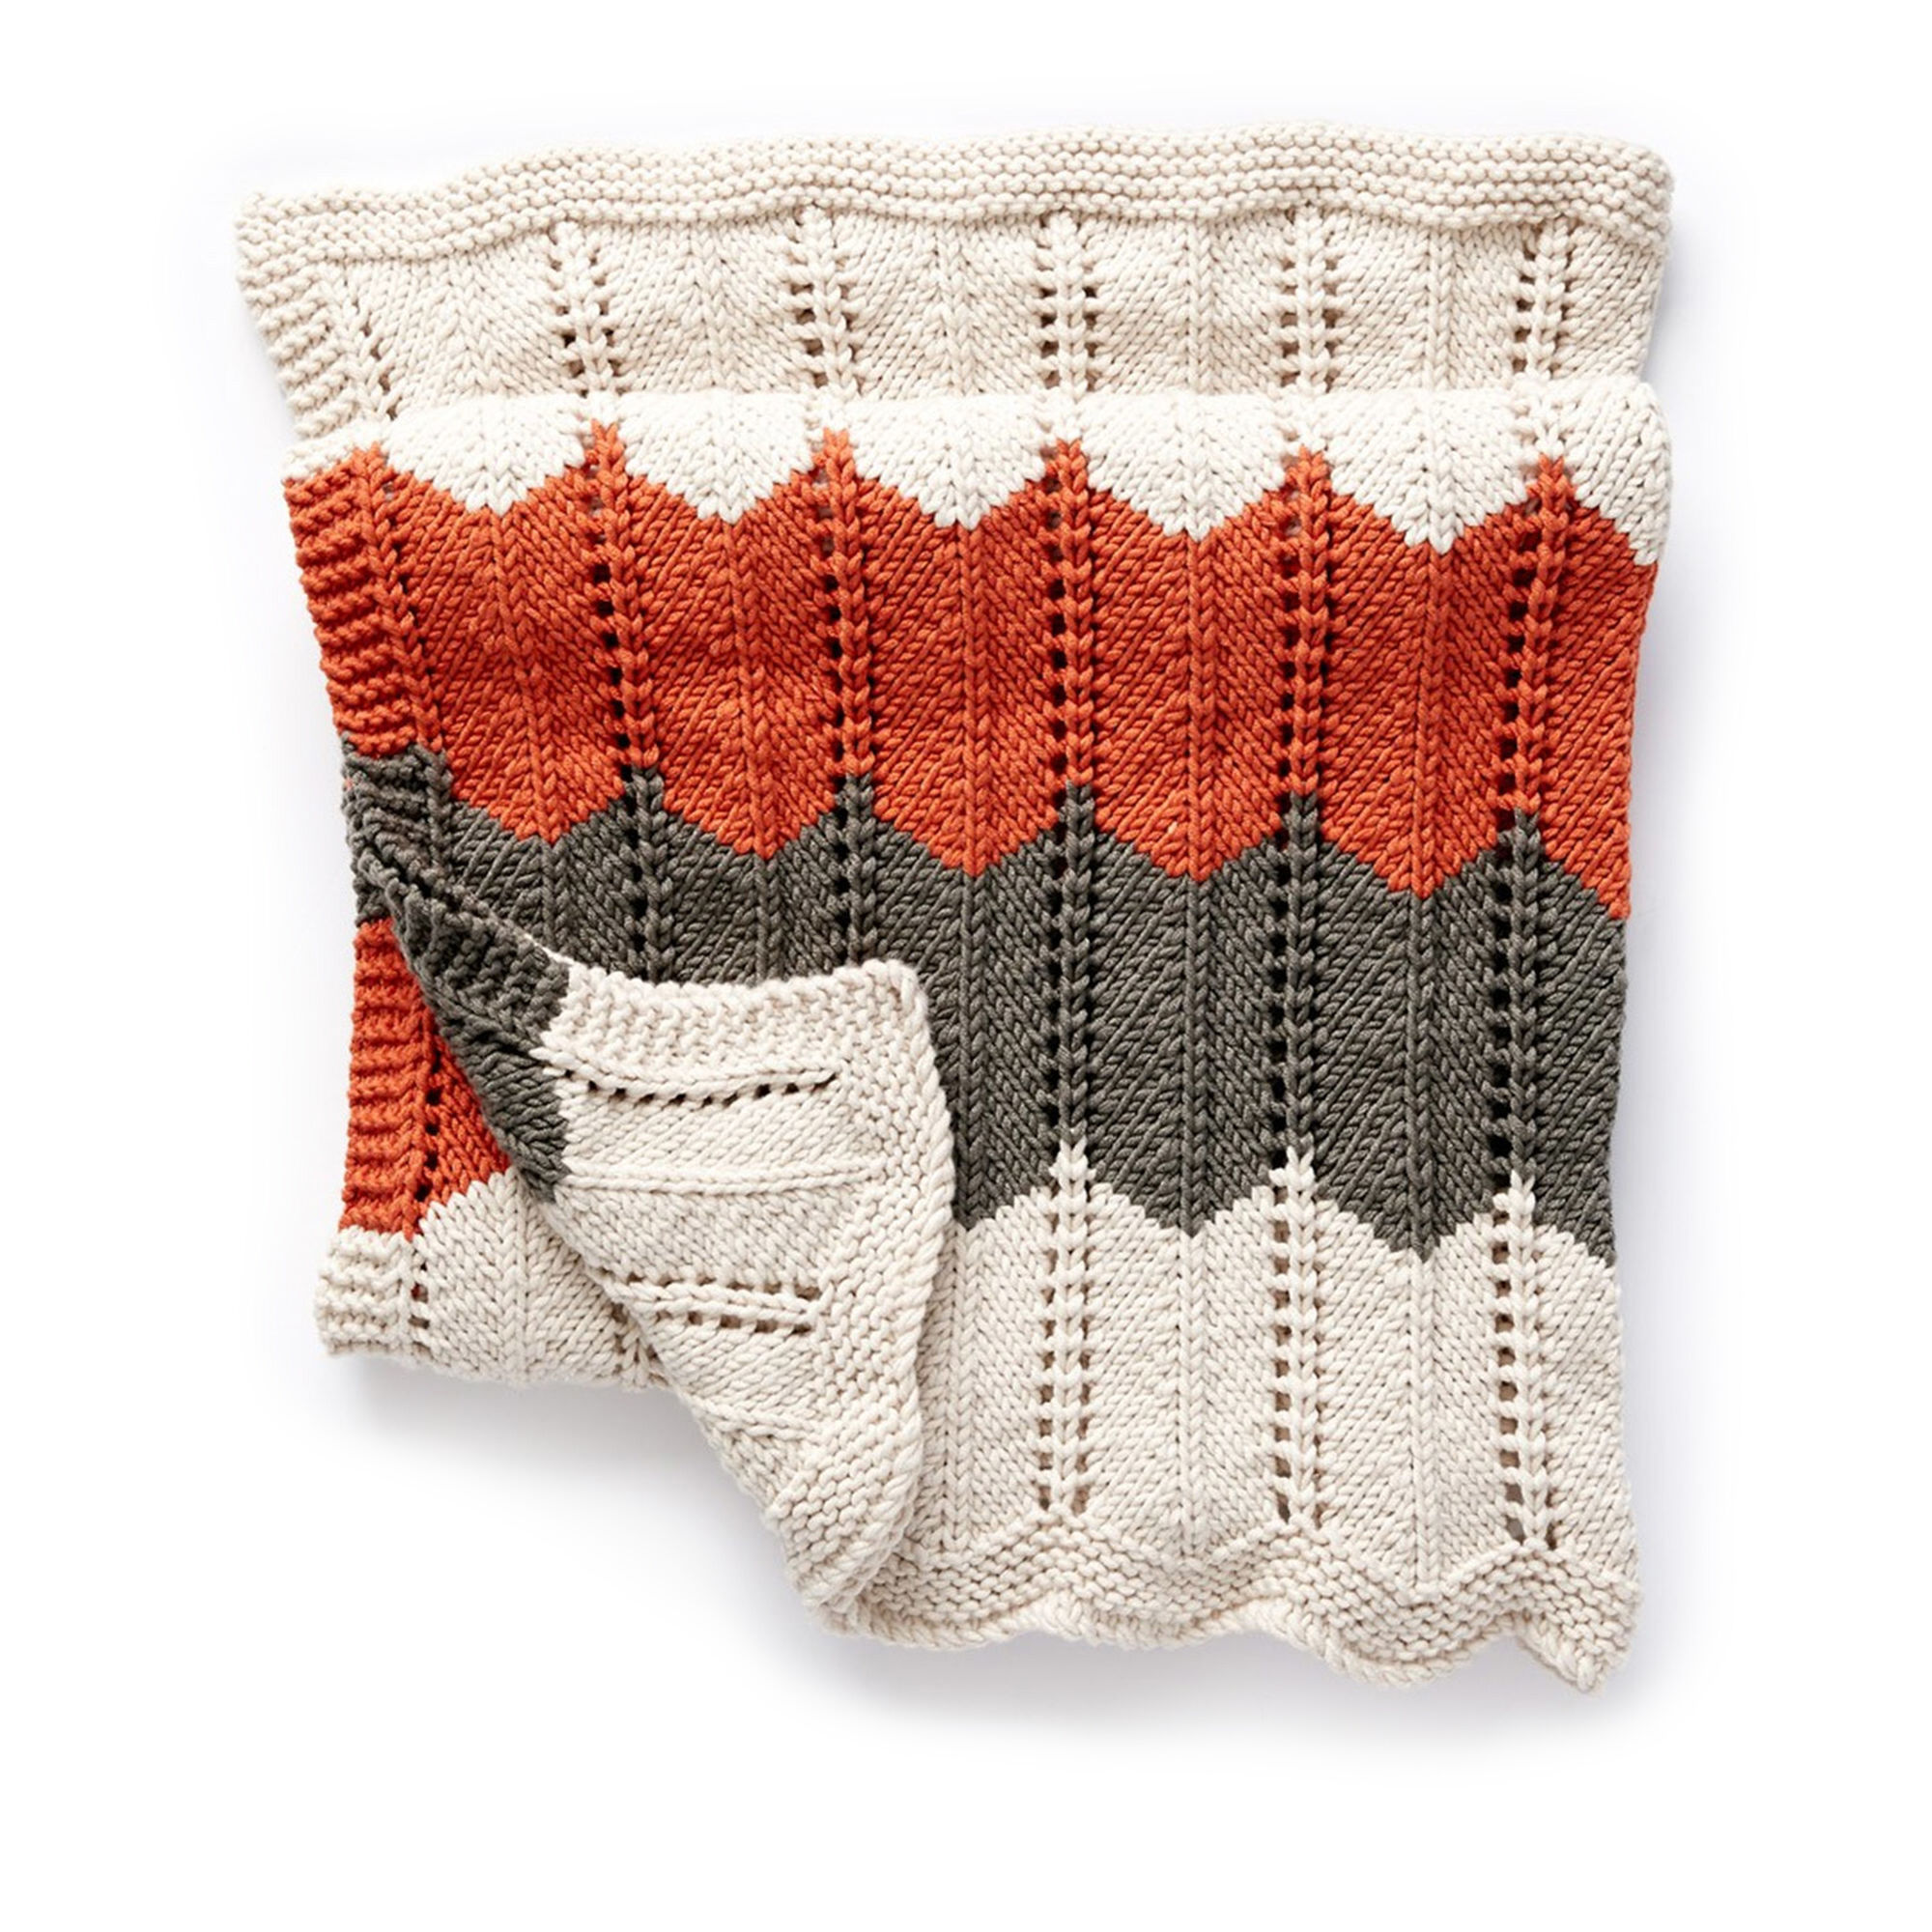 Bernat Ripple and Ridge Knit Blanket | Yarnspirations